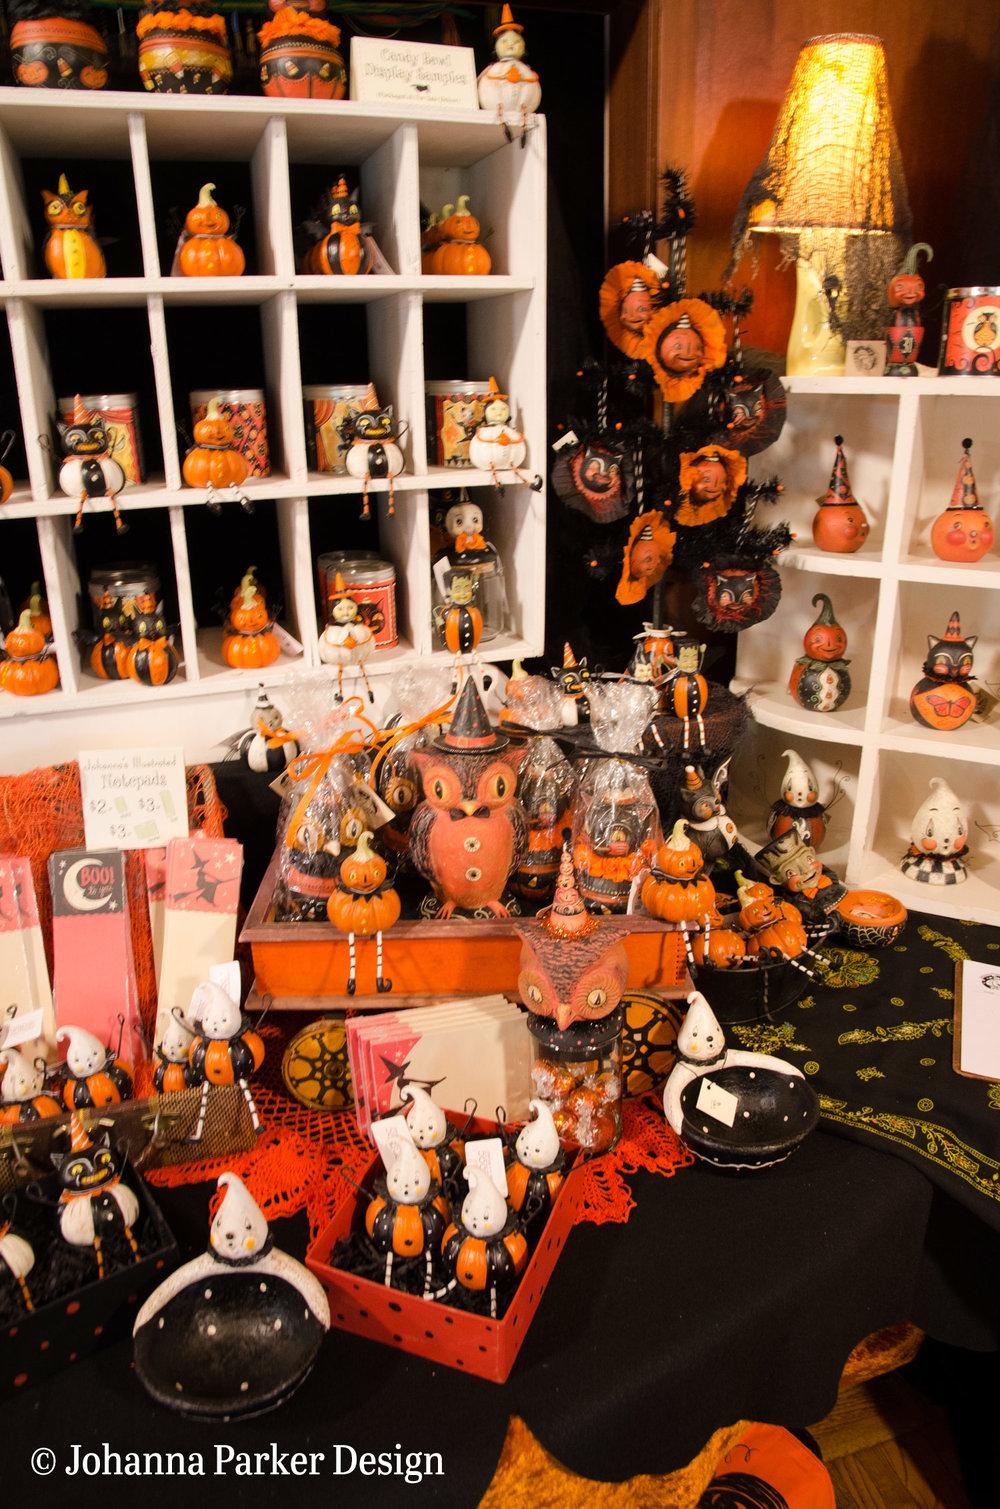 Halloween delights at the Glens Art Walk by Johanna Parker